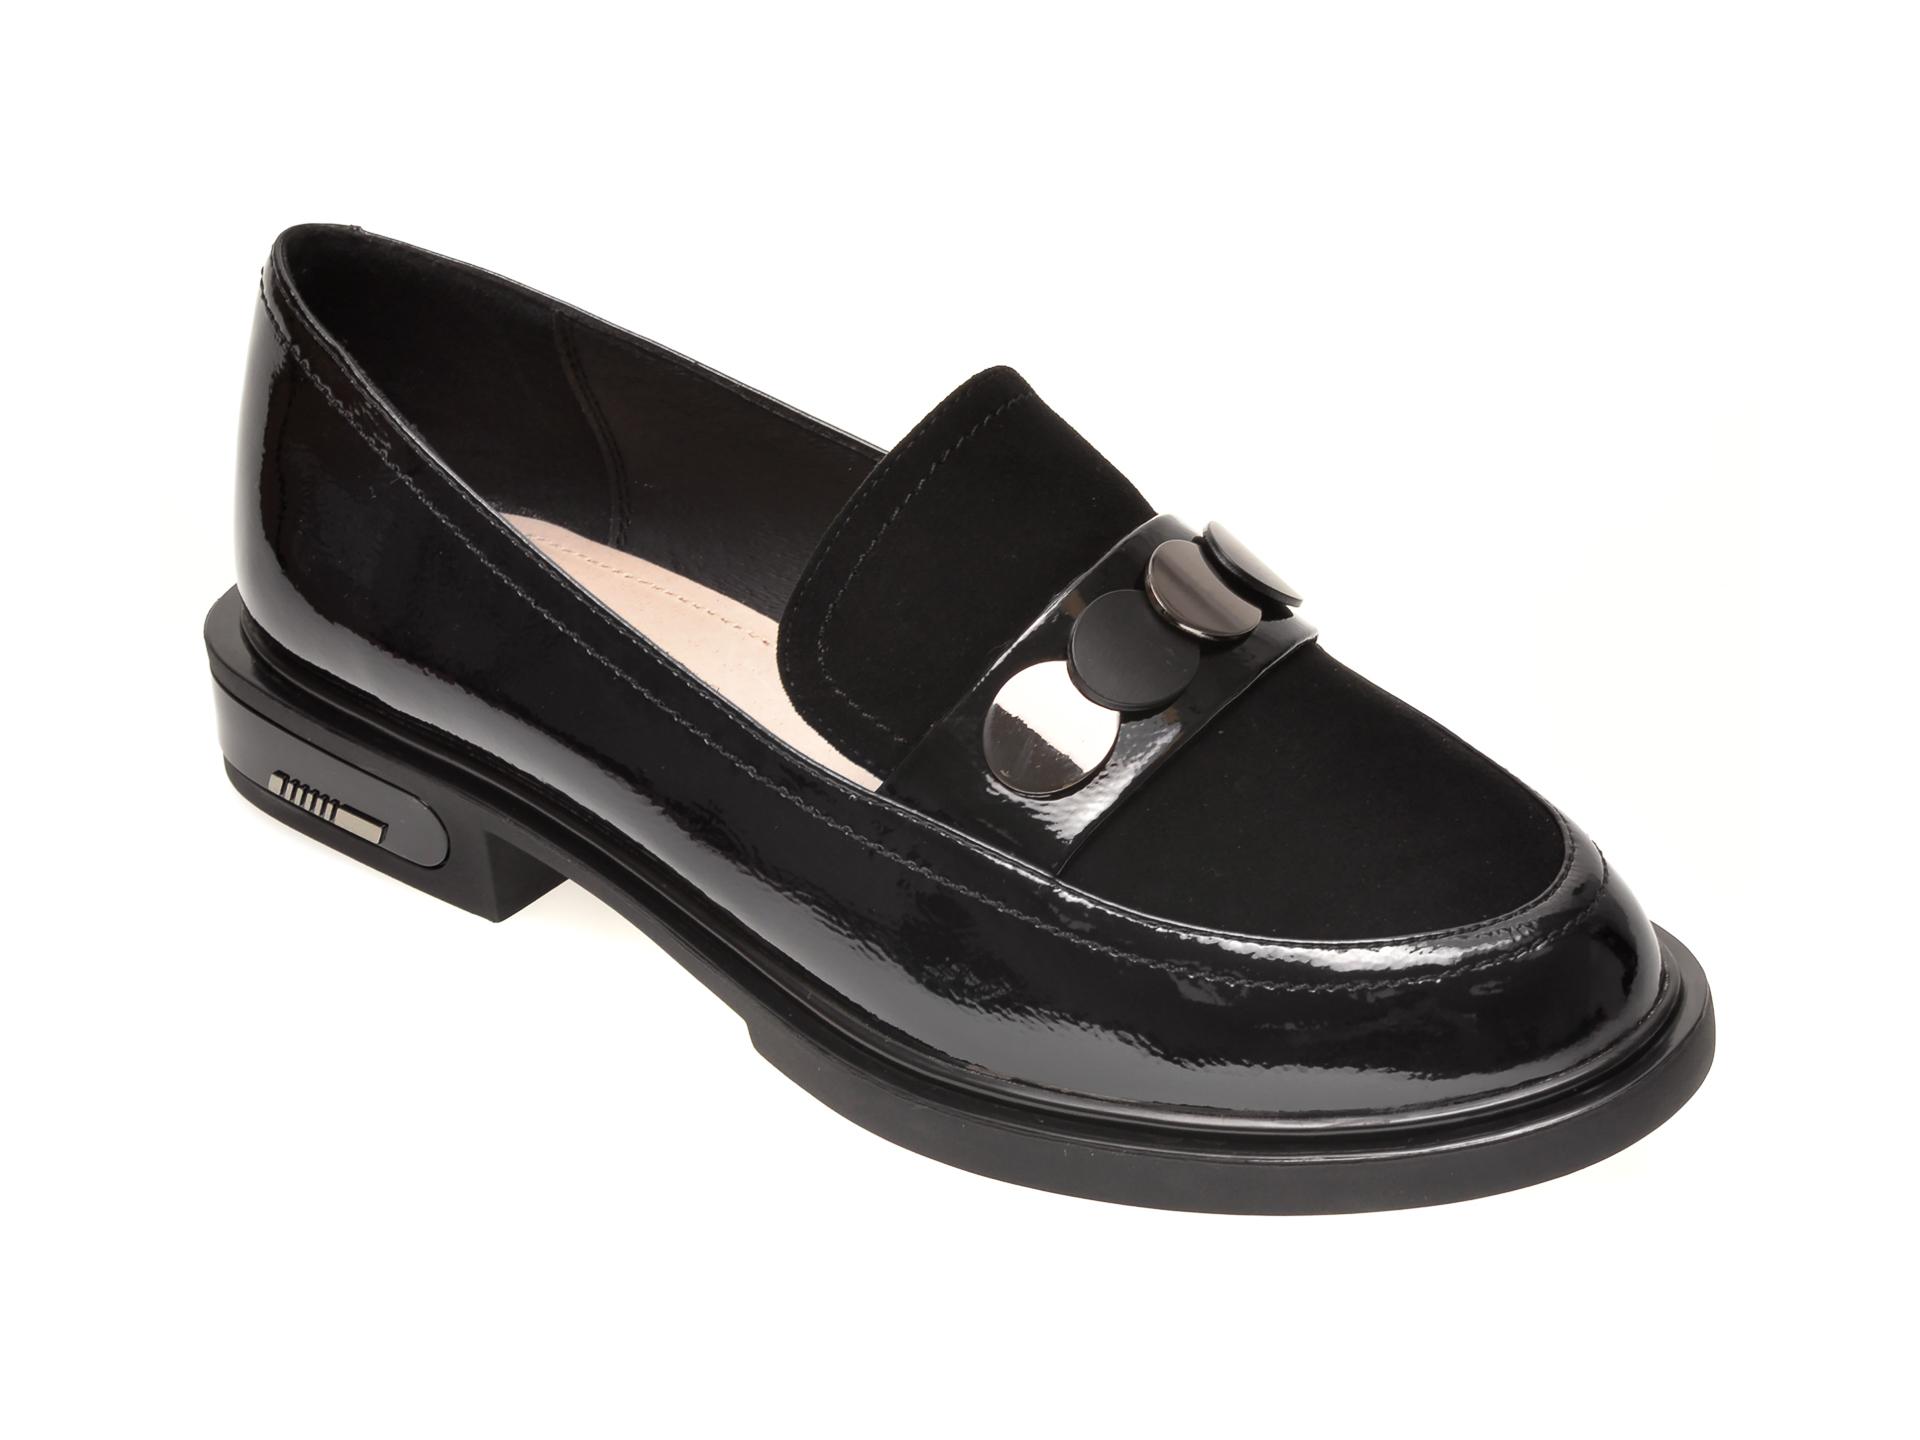 Pantofi EPICA negri, FH01399, din piele naturala